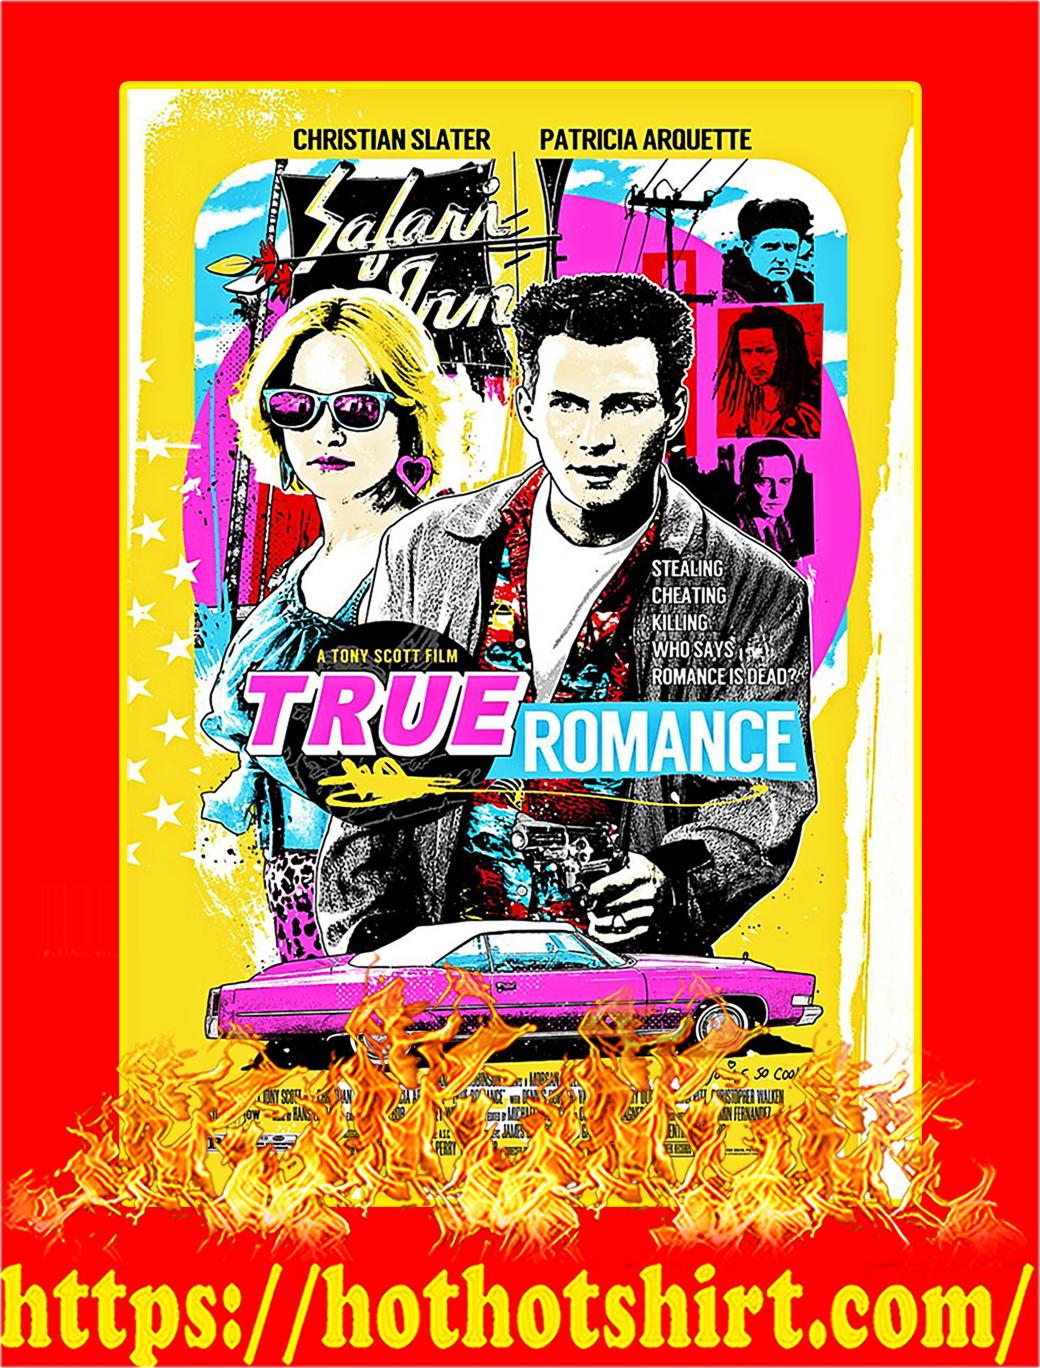 True Romance Poster - A3